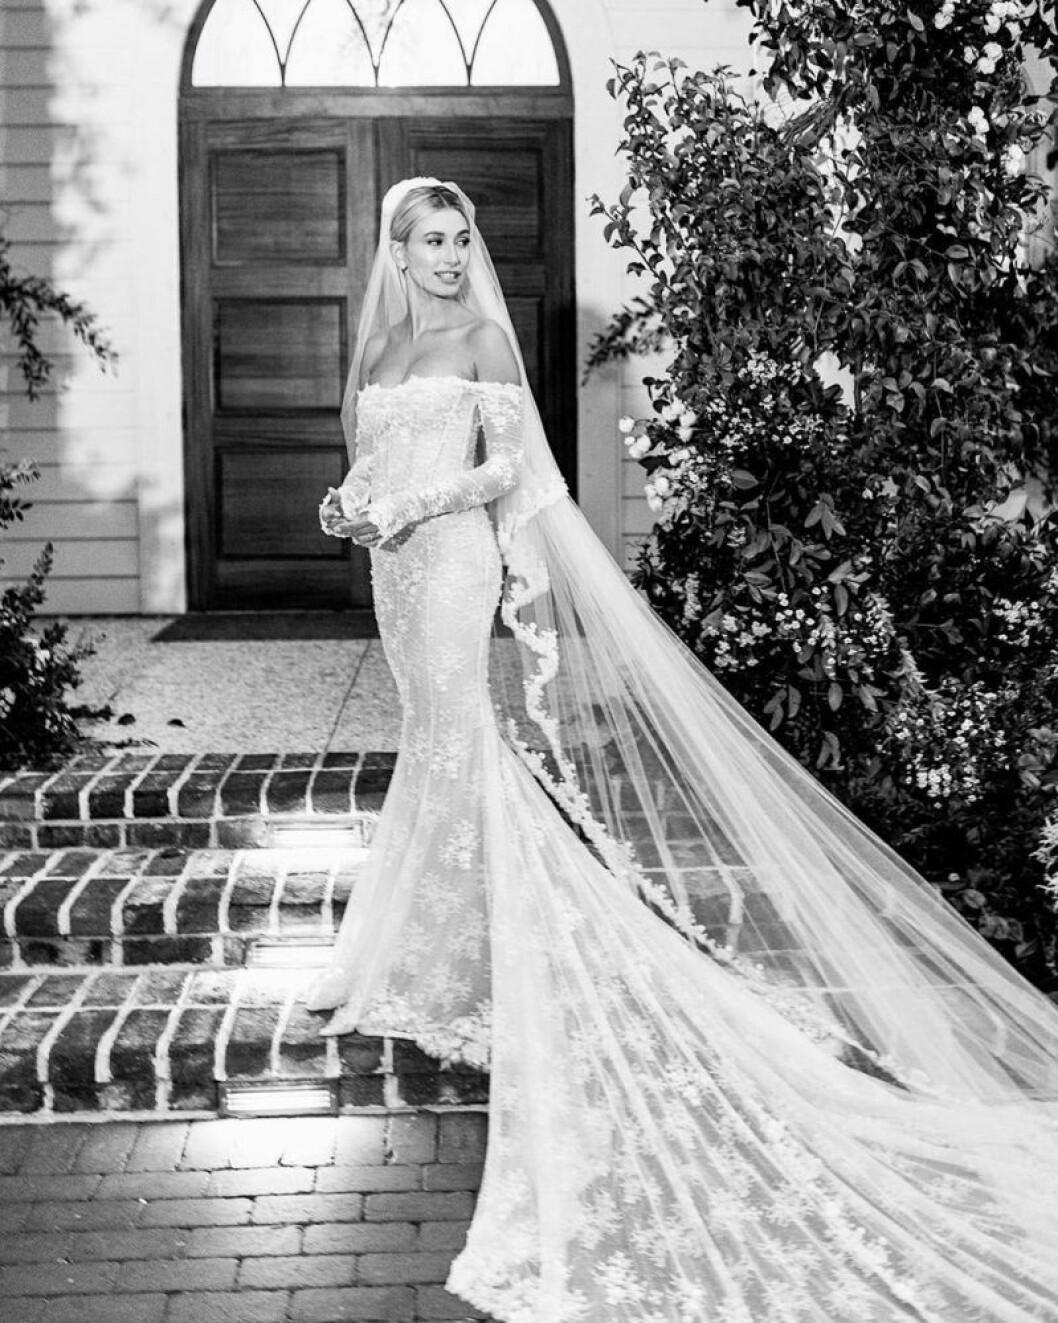 Hailey Beiber bröllopsklänning